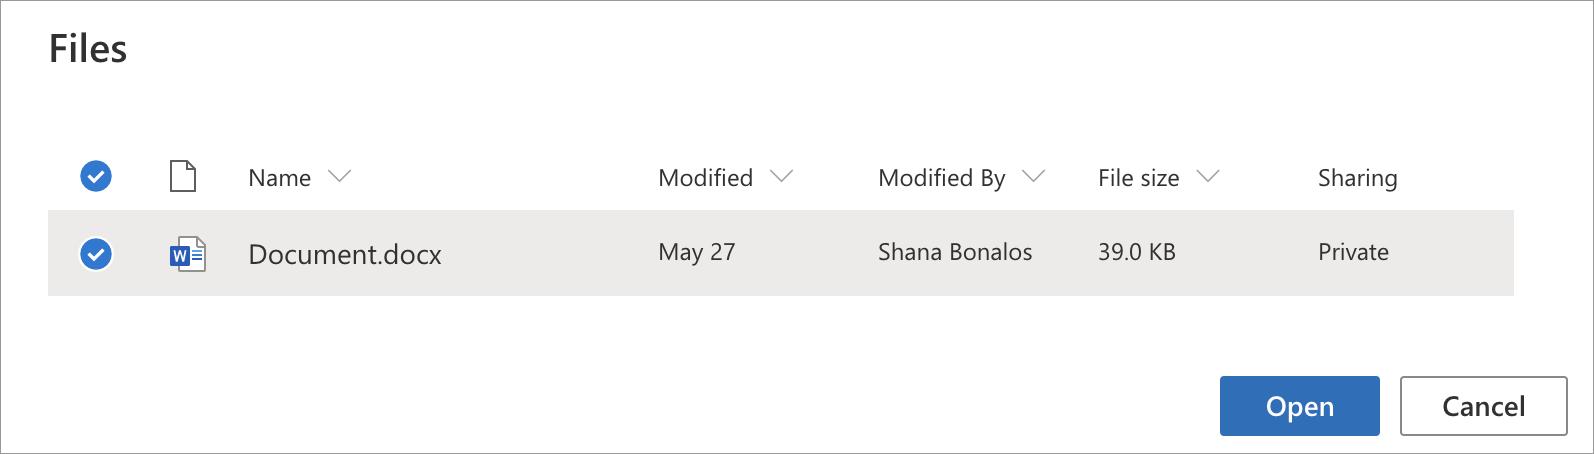 Choosing a file from Microsoft OneDrive